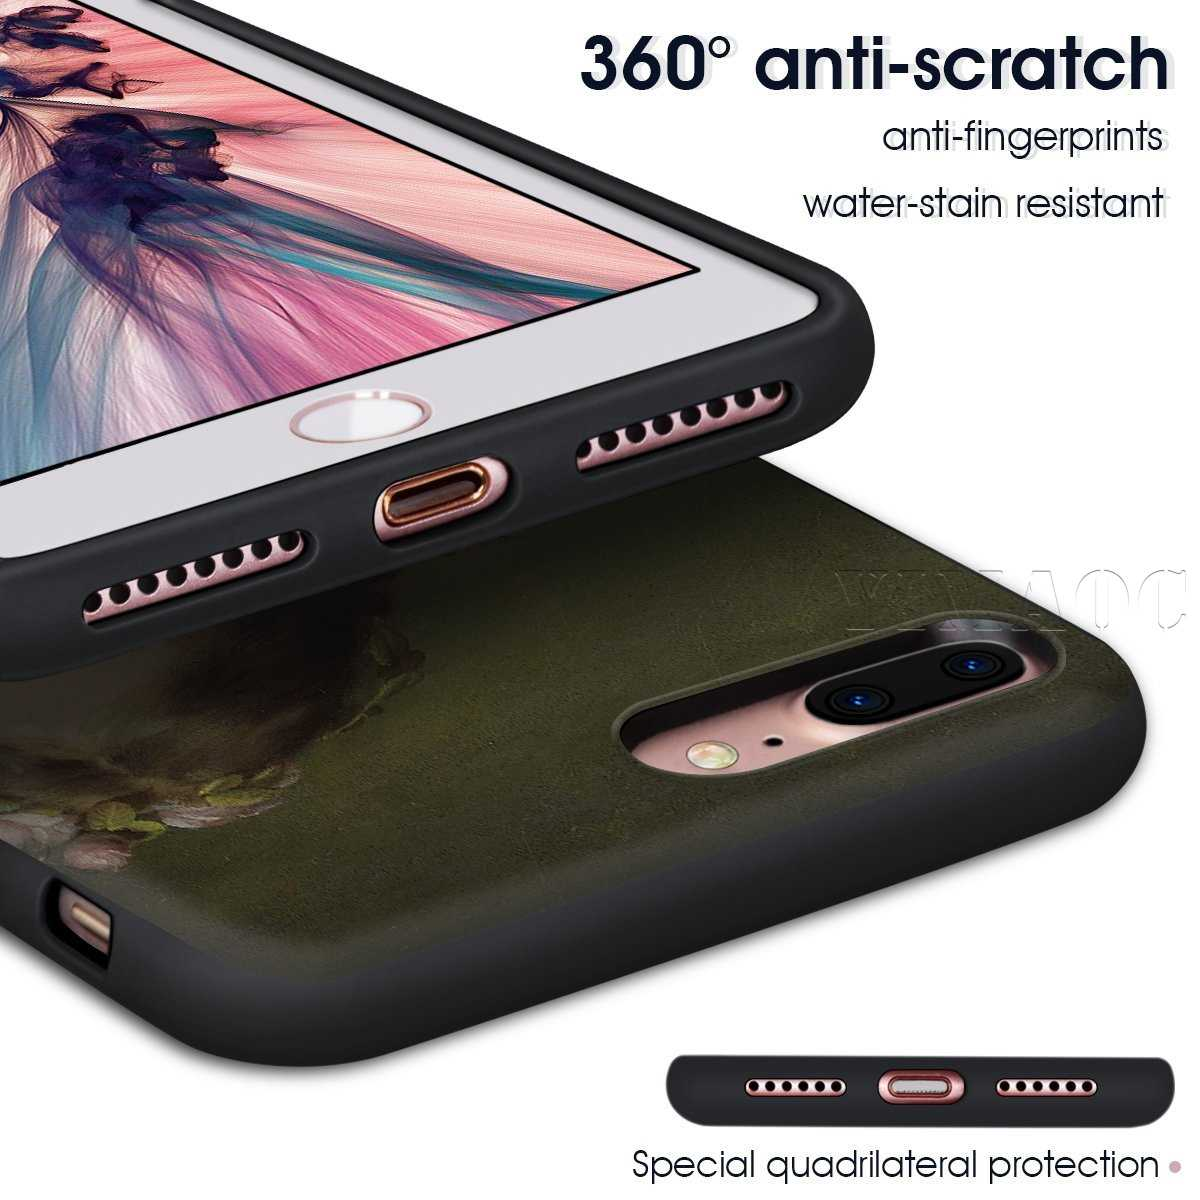 Классический эстетический чехол с цветочным рисунком для Huawei Mate 20 Honor 6a 7a 7c 7x 8c 8x9 10 Nova 3i 3 Lite Pro Y6 P30 P smart